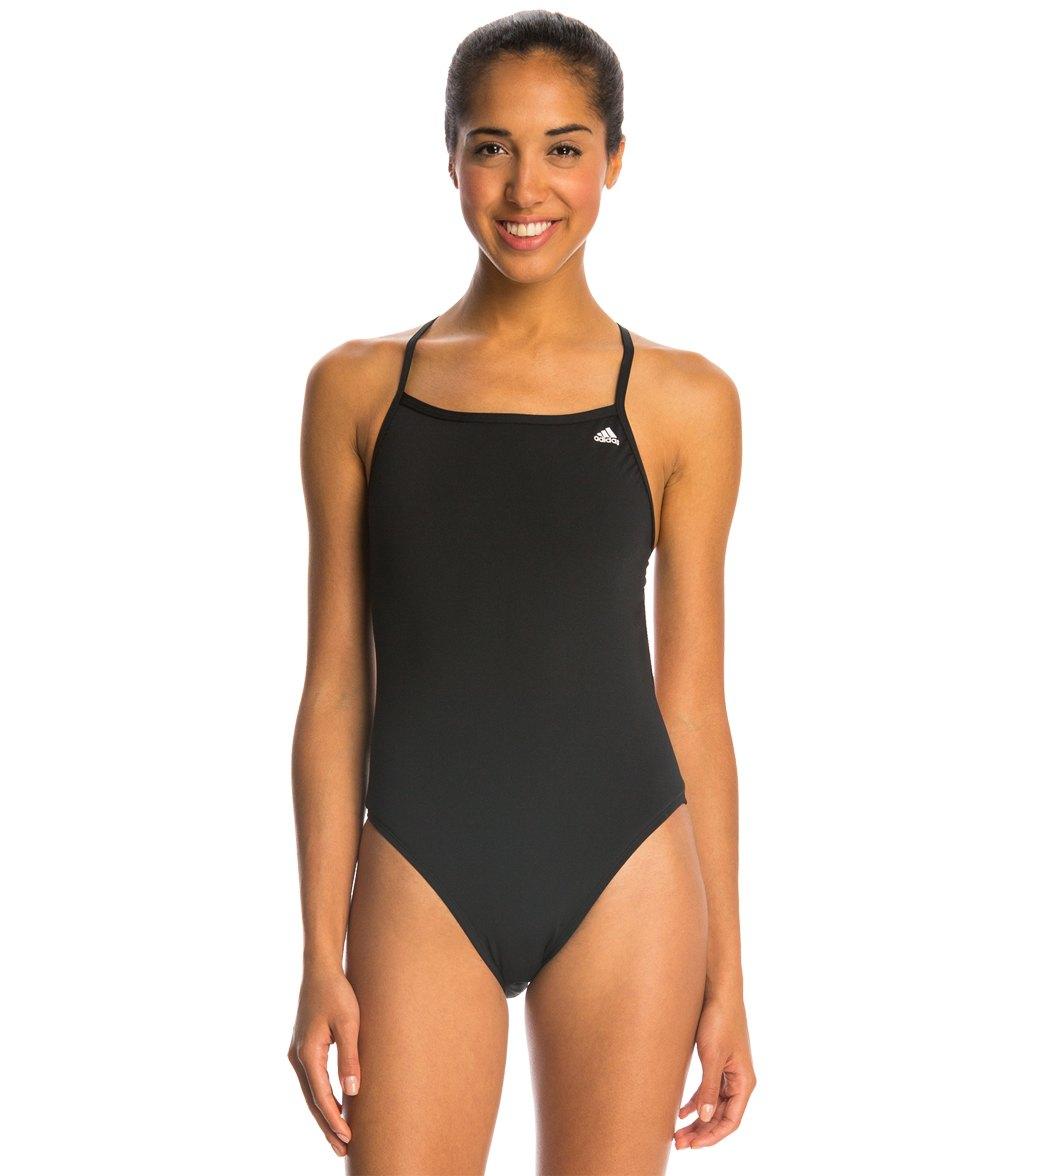 Adidas Women's Infinitex + Solids C Back One Piece Swimsuit